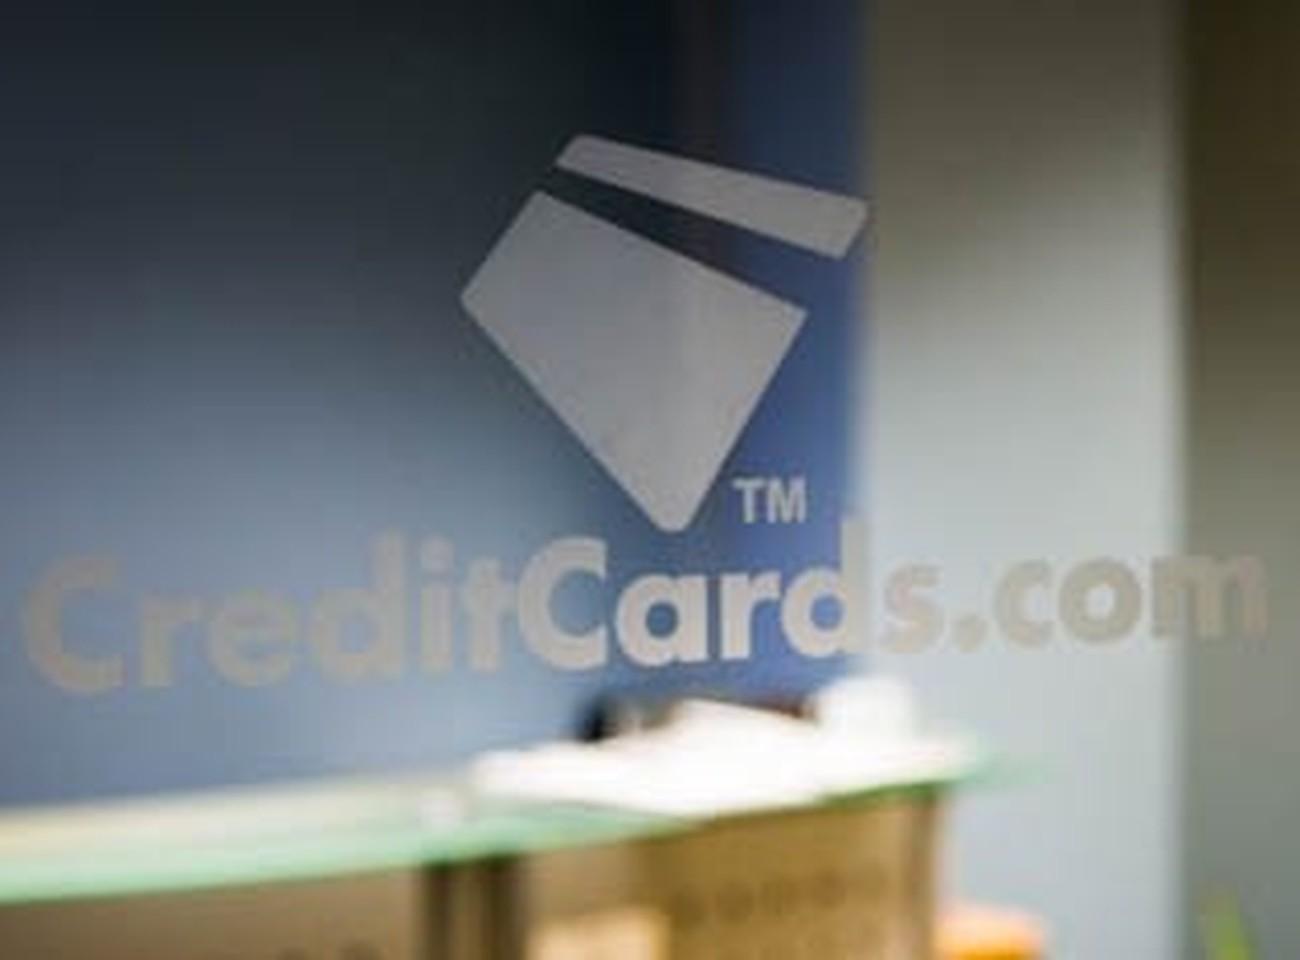 CreditCards.com Careers